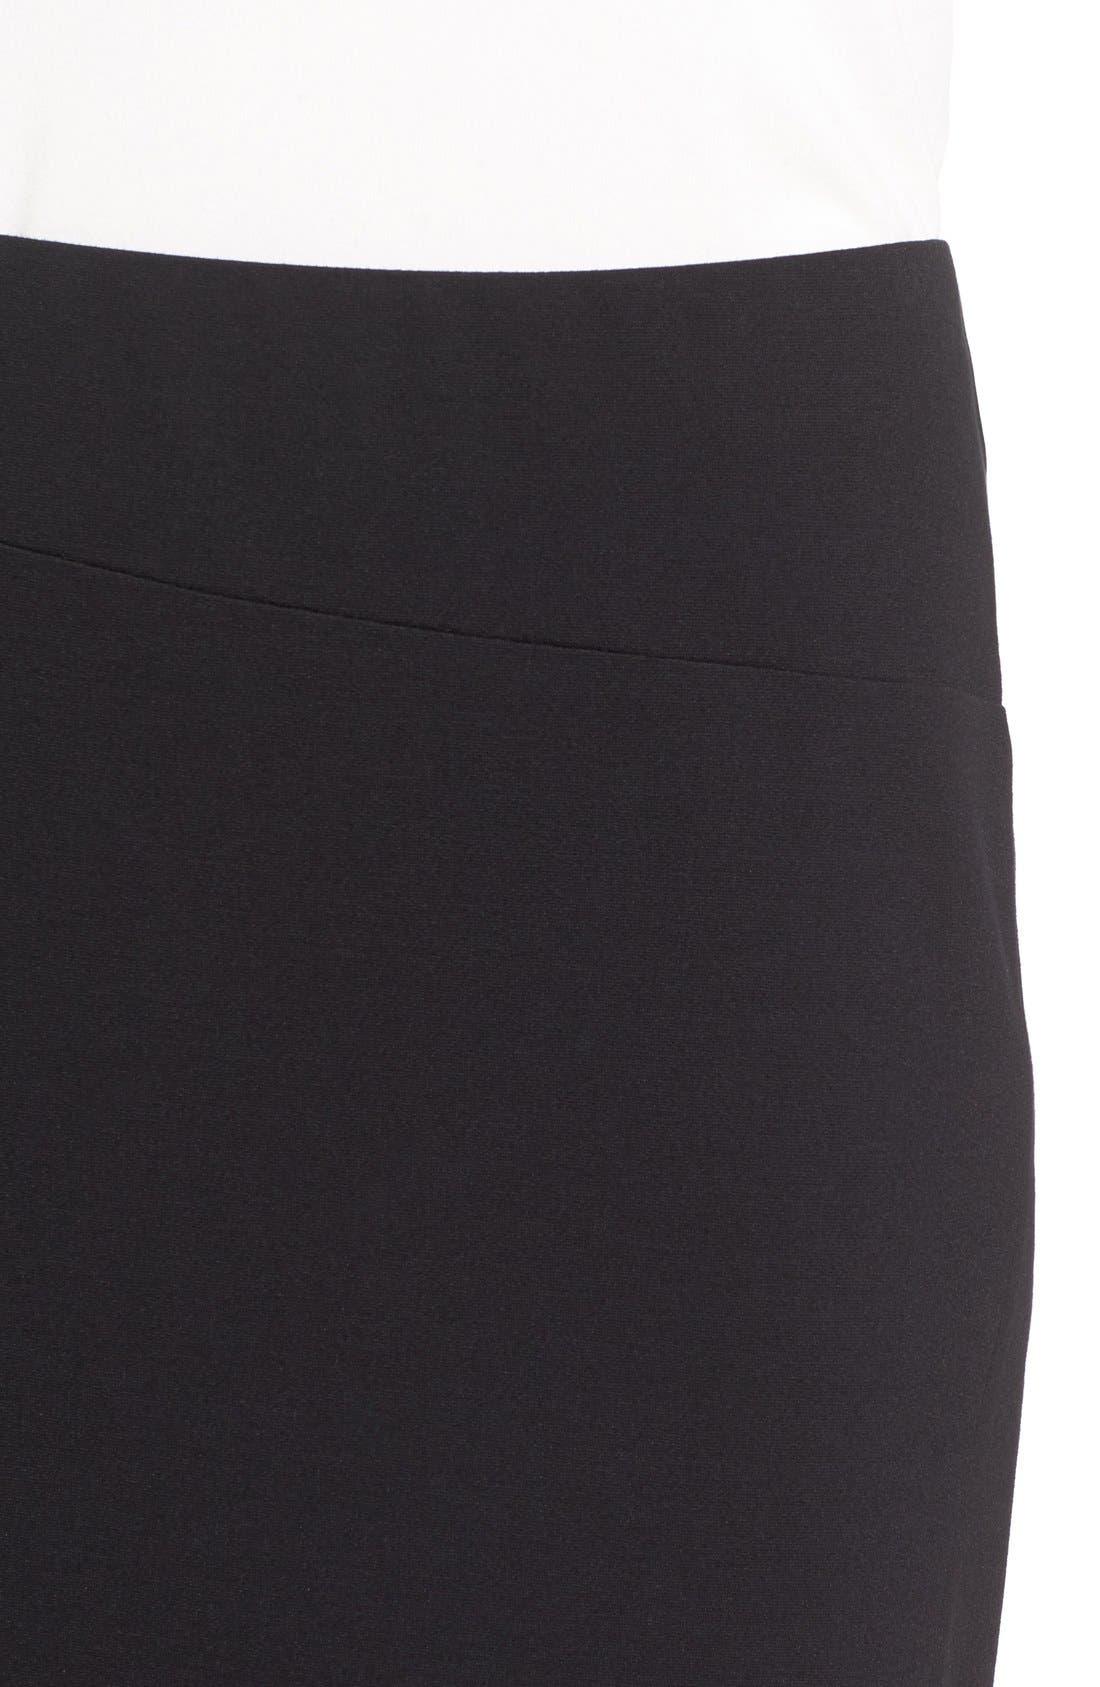 Slit Pencil Skirt,                             Alternate thumbnail 4, color,                             006